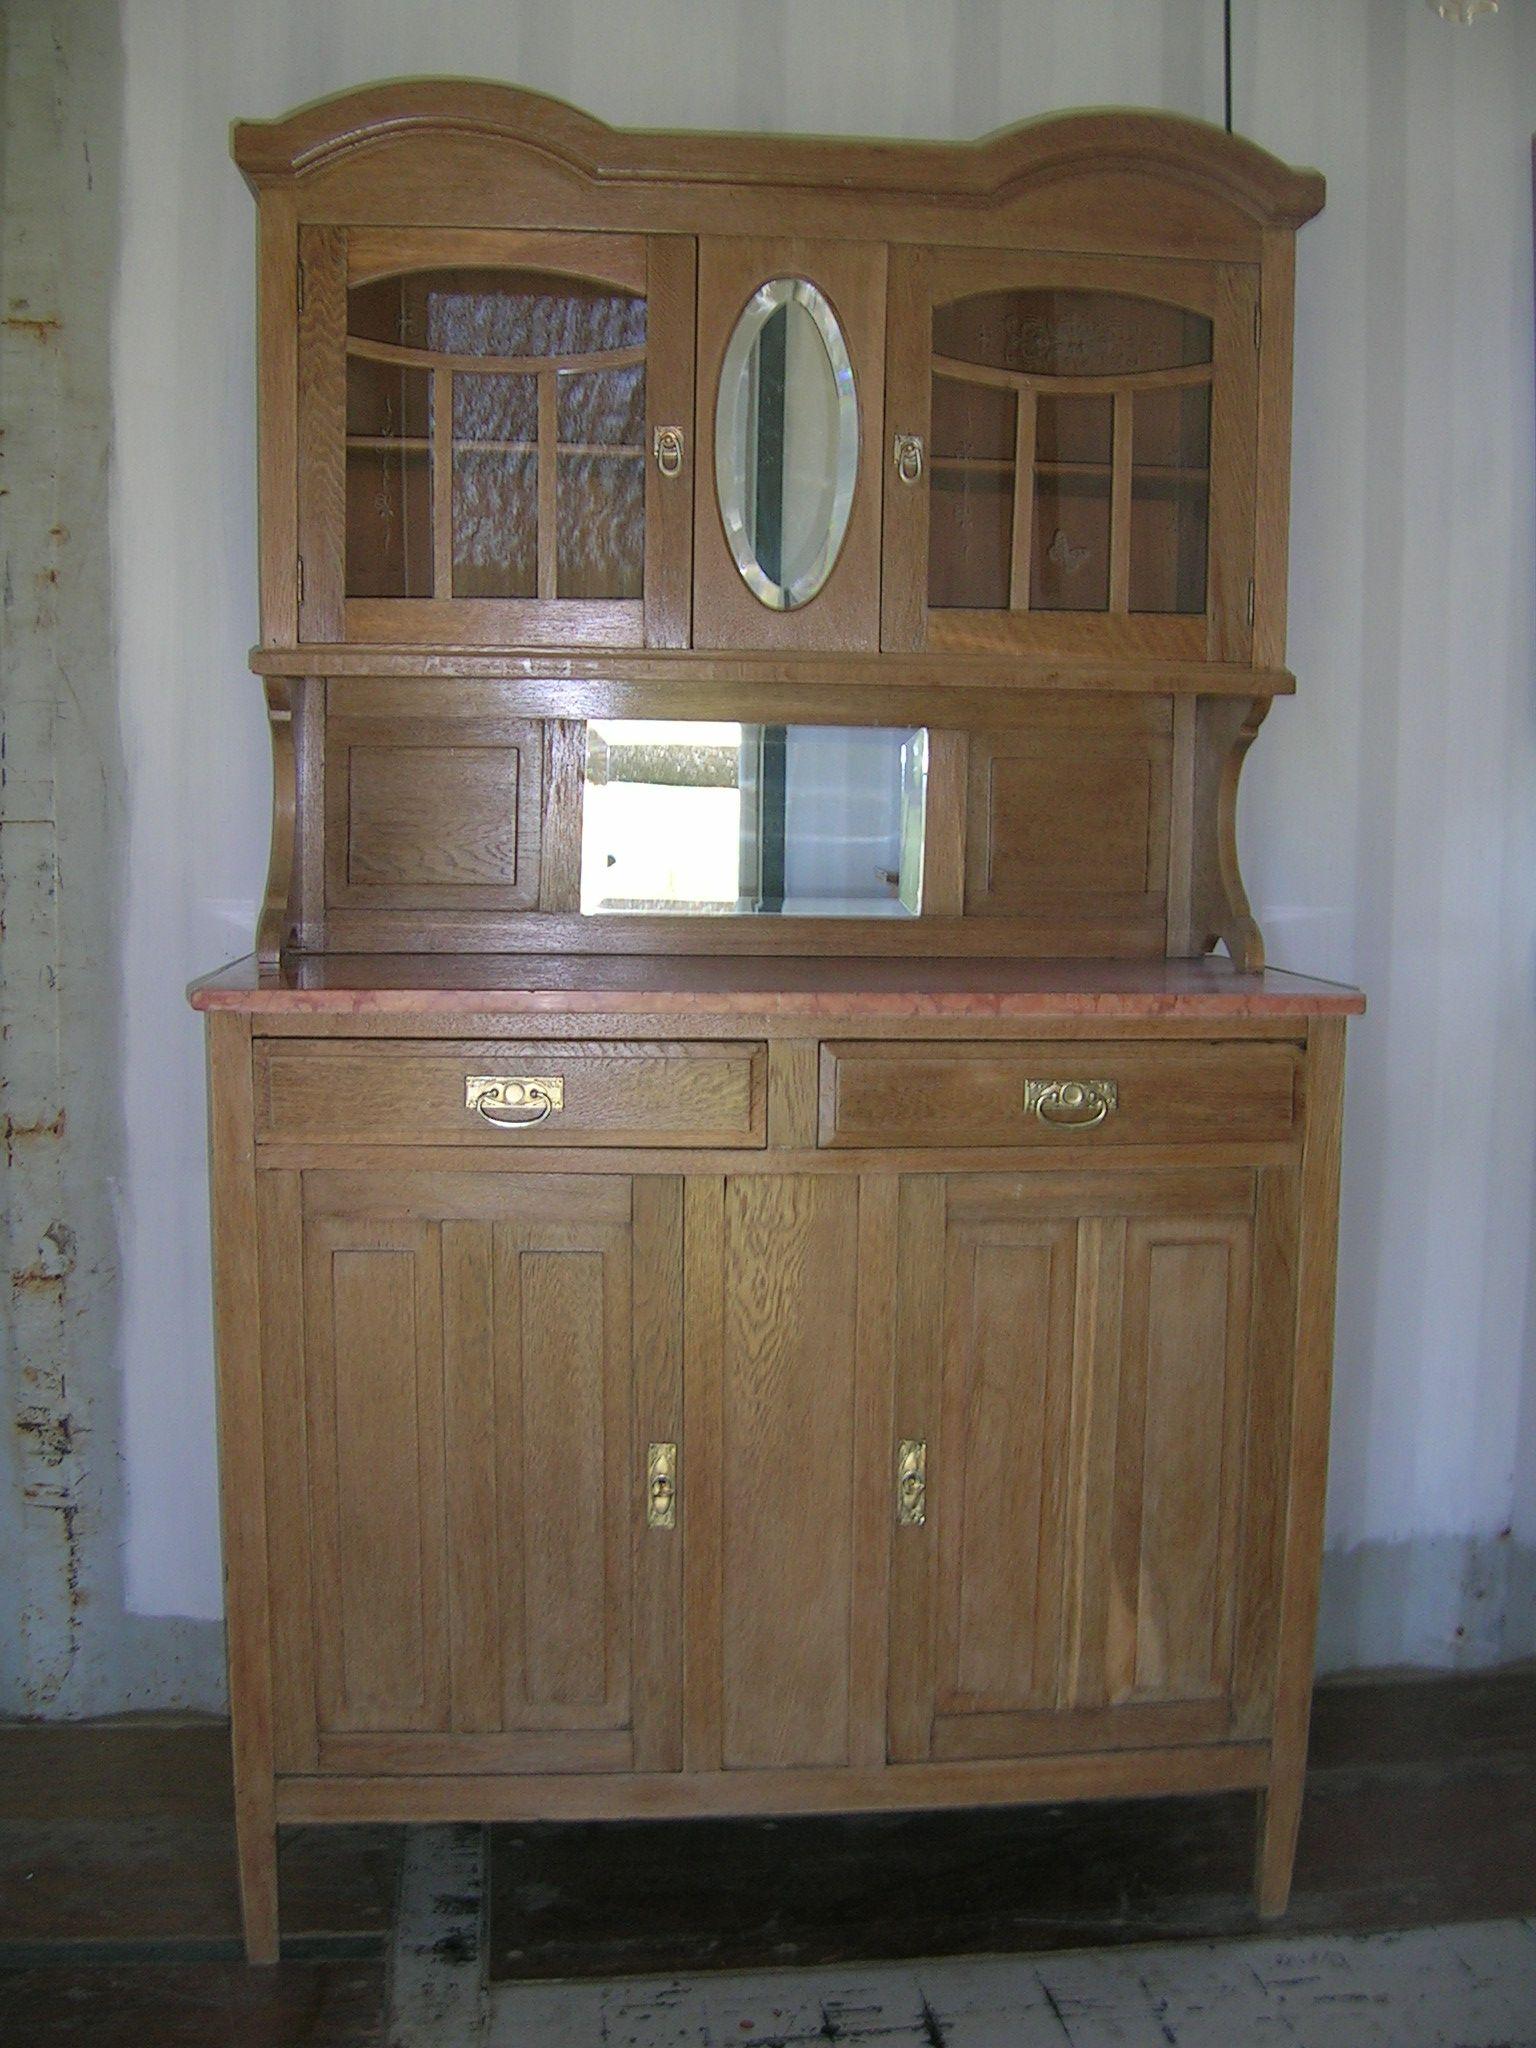 Aparador de roble muebles de campo restaurados pinterest - Muebles restaurados vintage ...